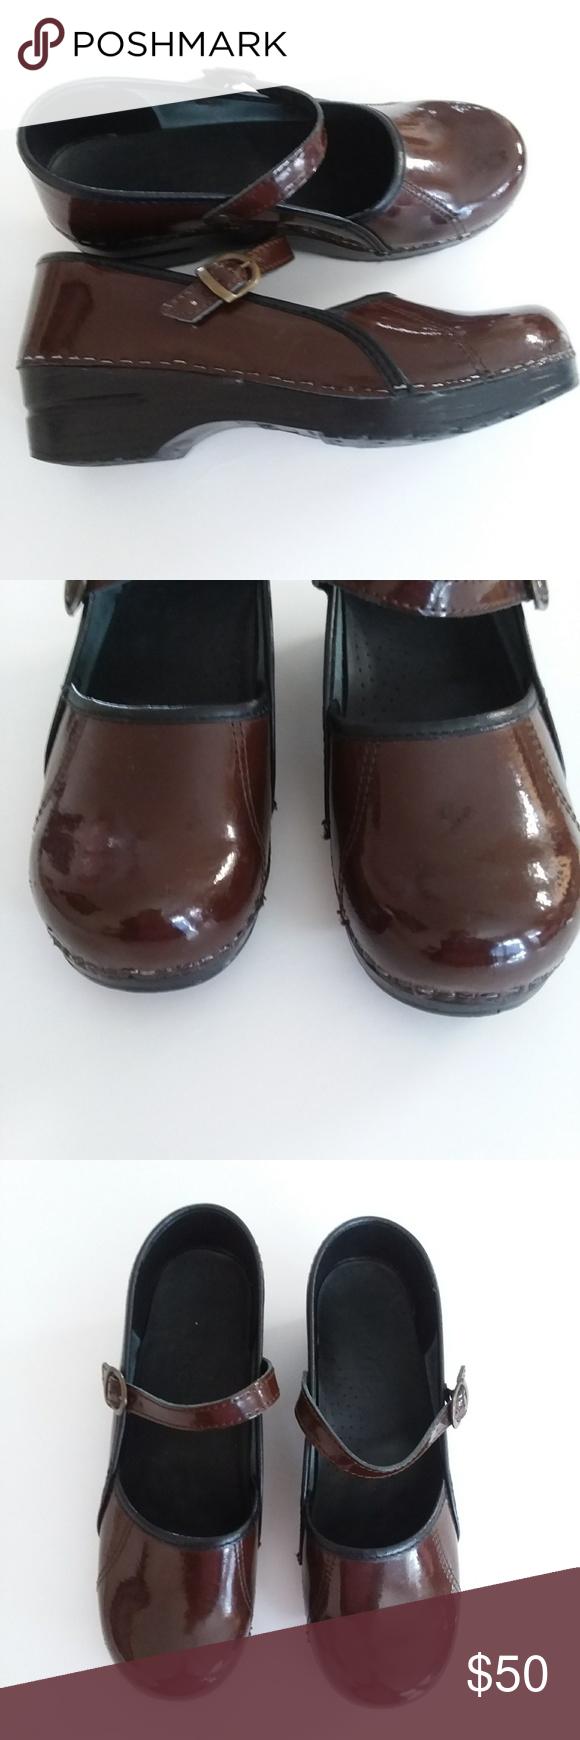 09cc30097aade $30 Sale! Sanita Mary Jane Brown Black Clogs Sanita Mary Jane Clogs ...